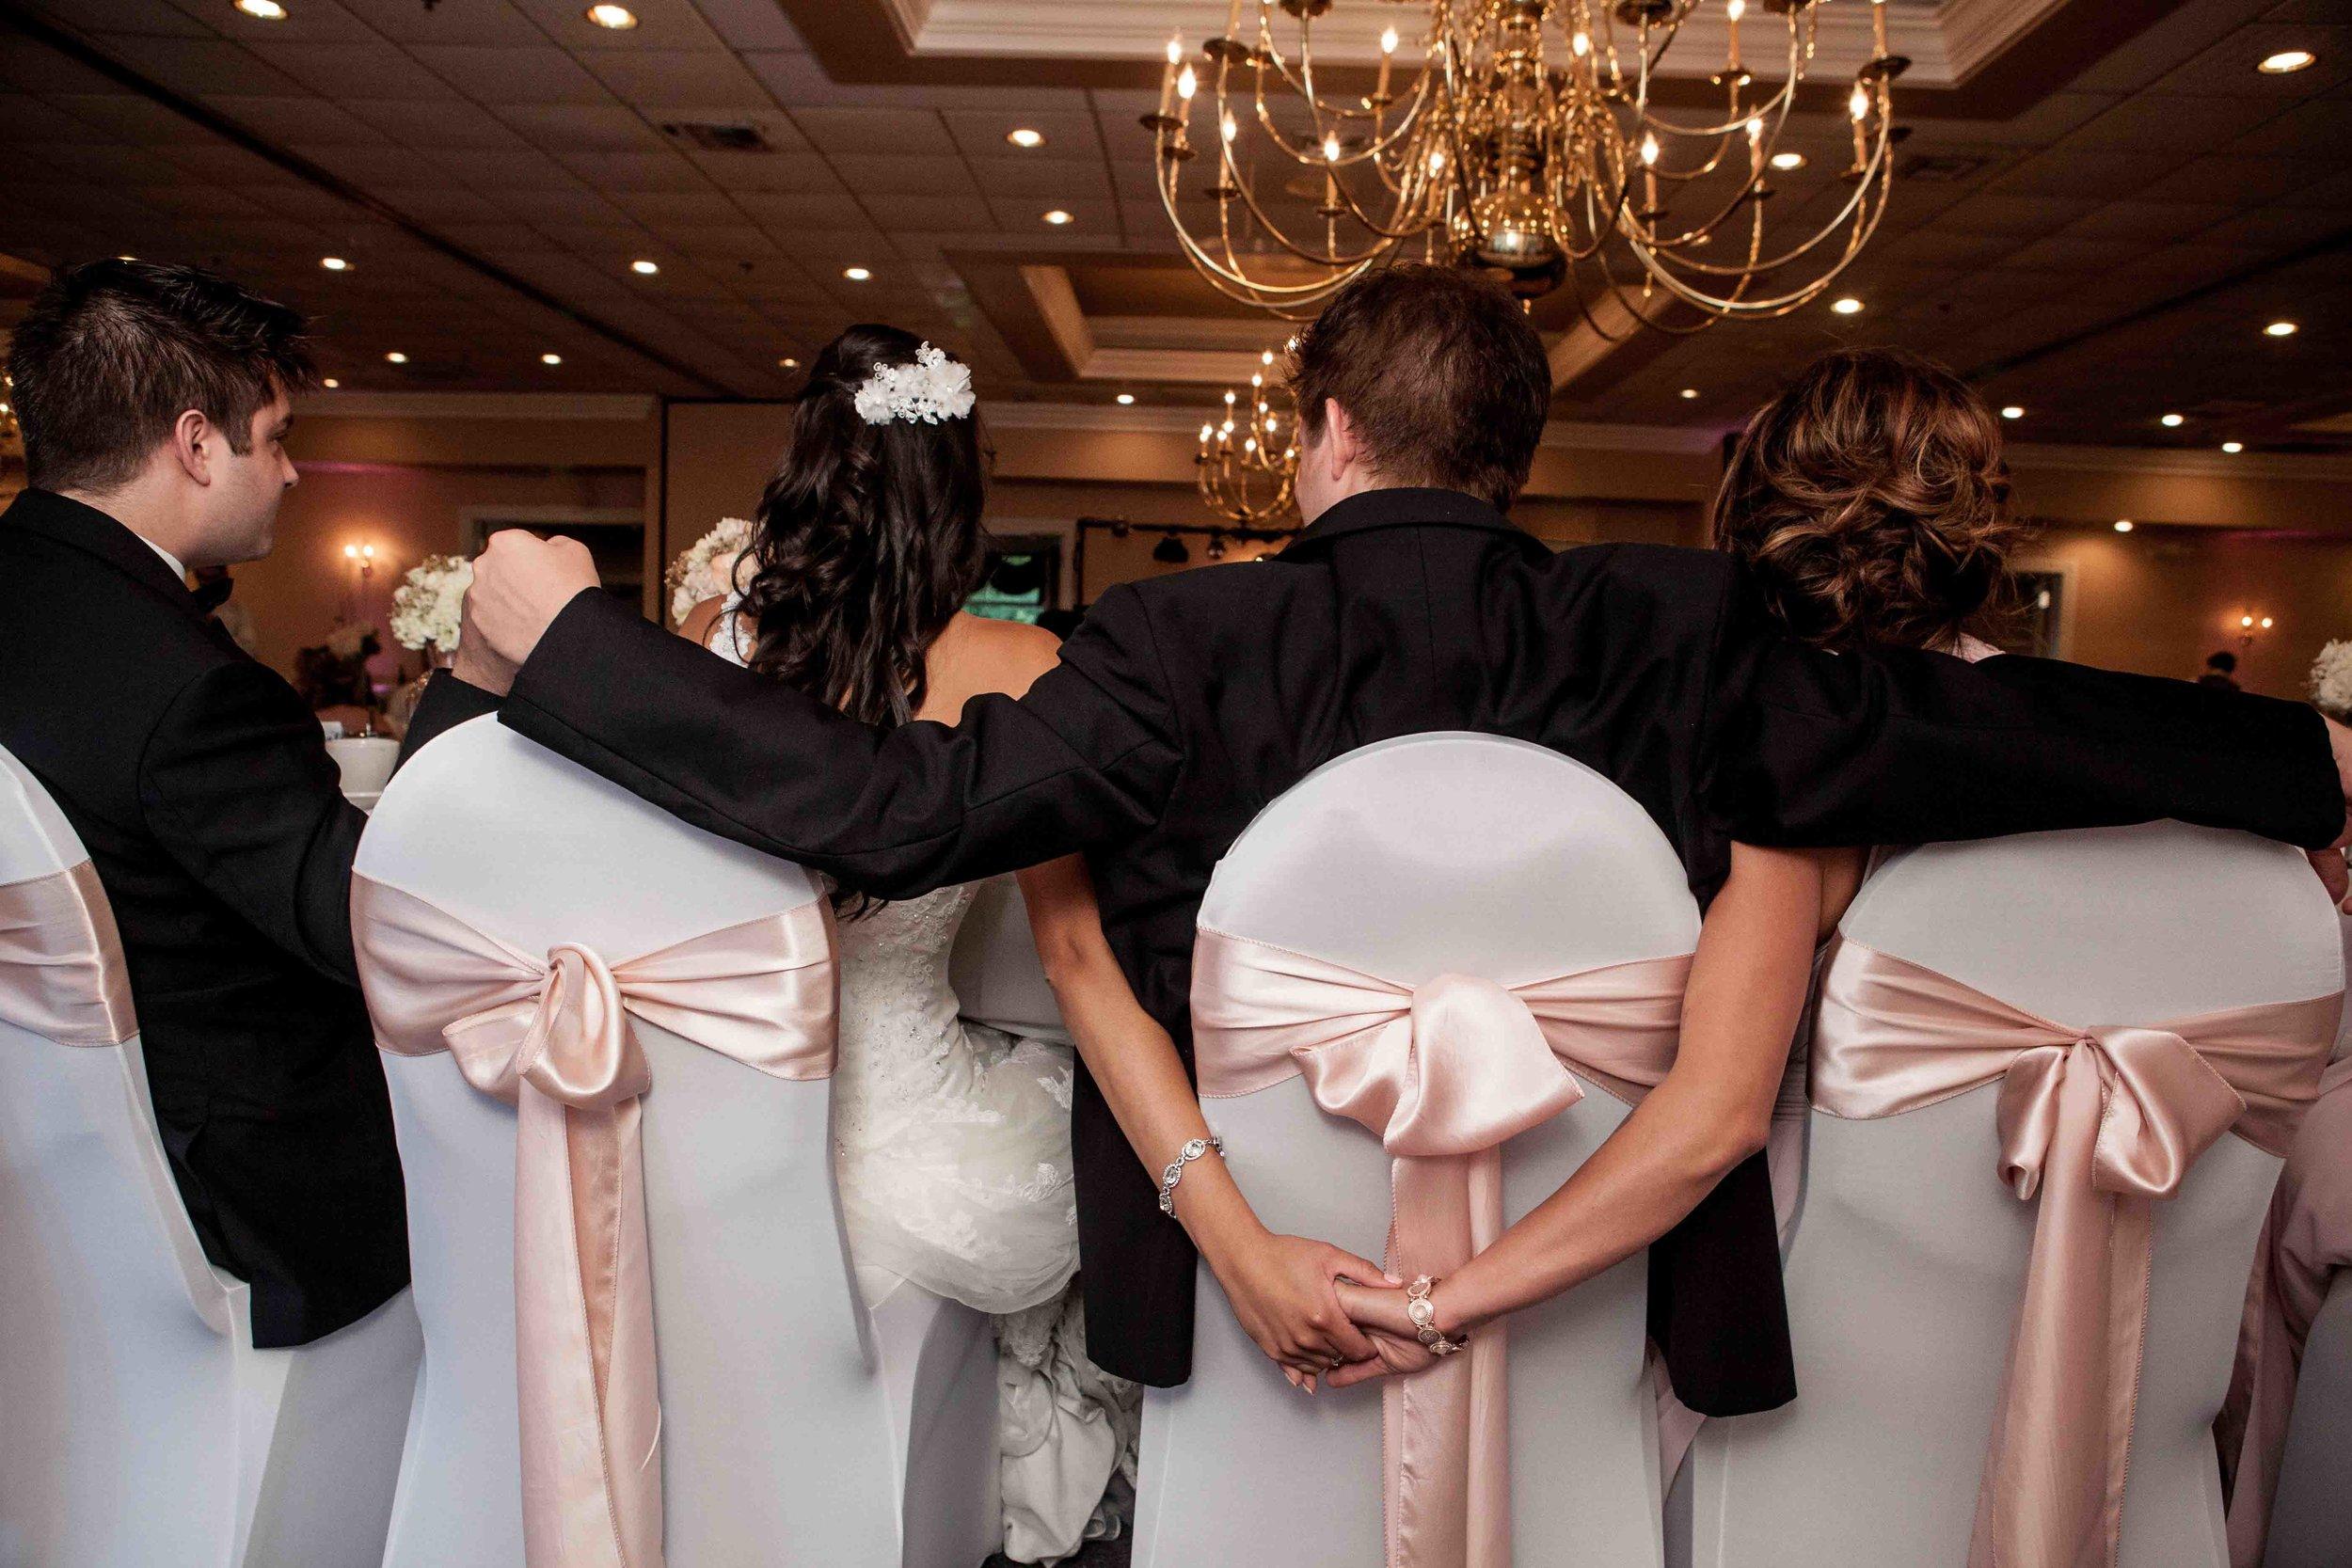 Destination Photographer wedding photos Best Wedding Photography Rose Photo -31.jpg